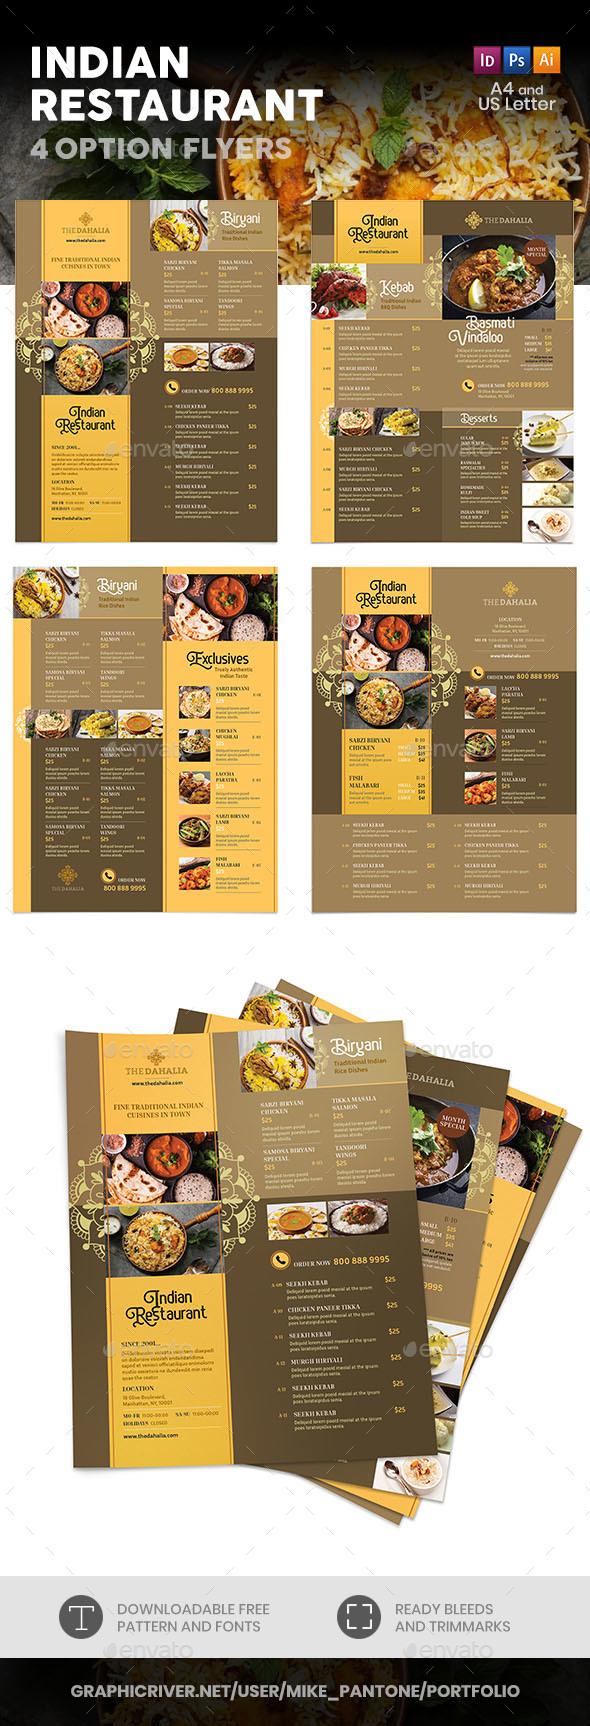 Indian Restaurant Menu Flyers 2 – 4 Options - Food Menus Print Templates